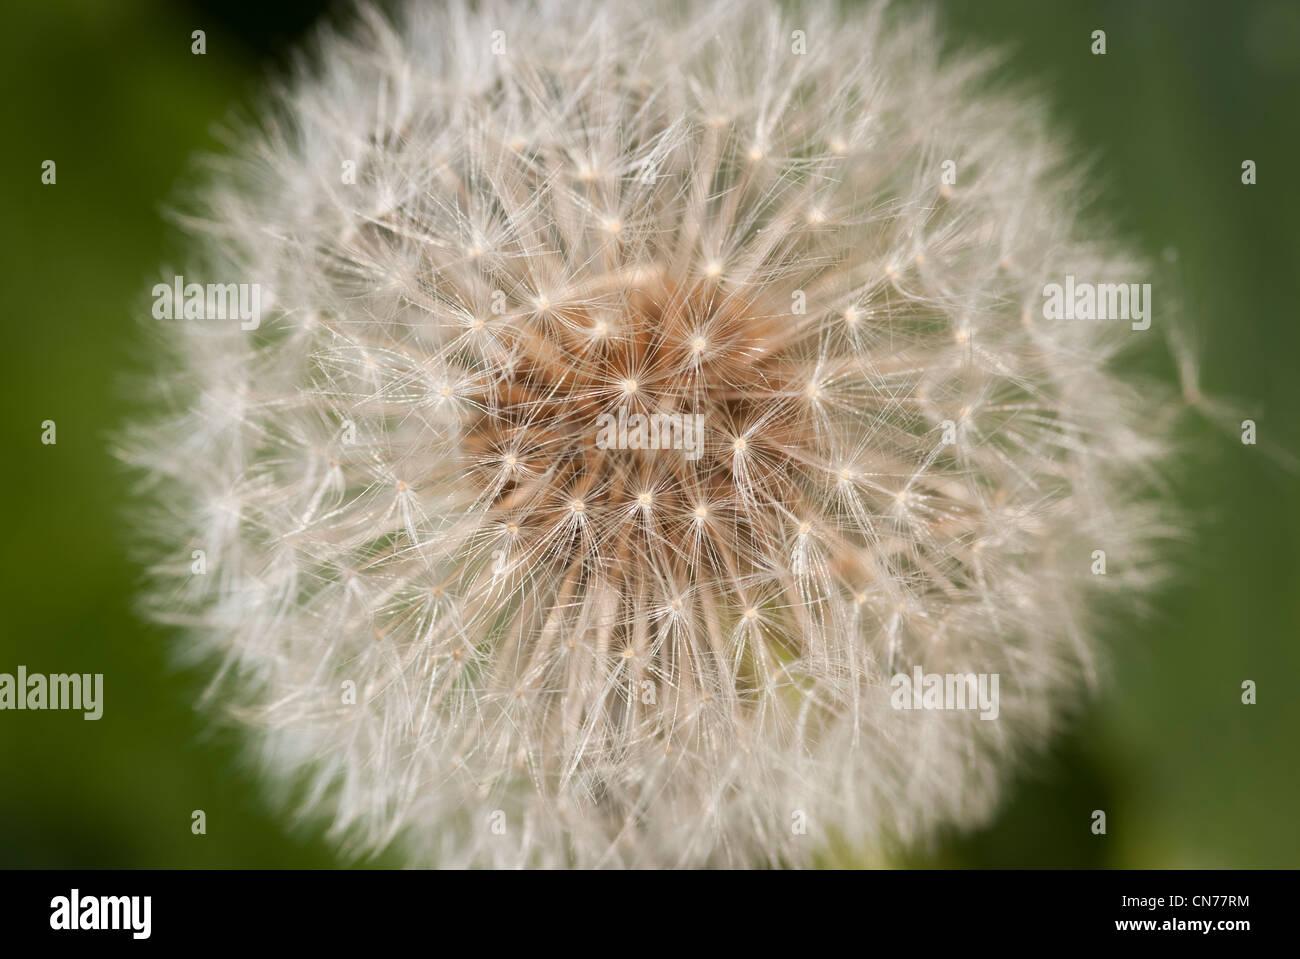 Macro, micro, close up photo, photograph of Dandelion seed head Stock Photo